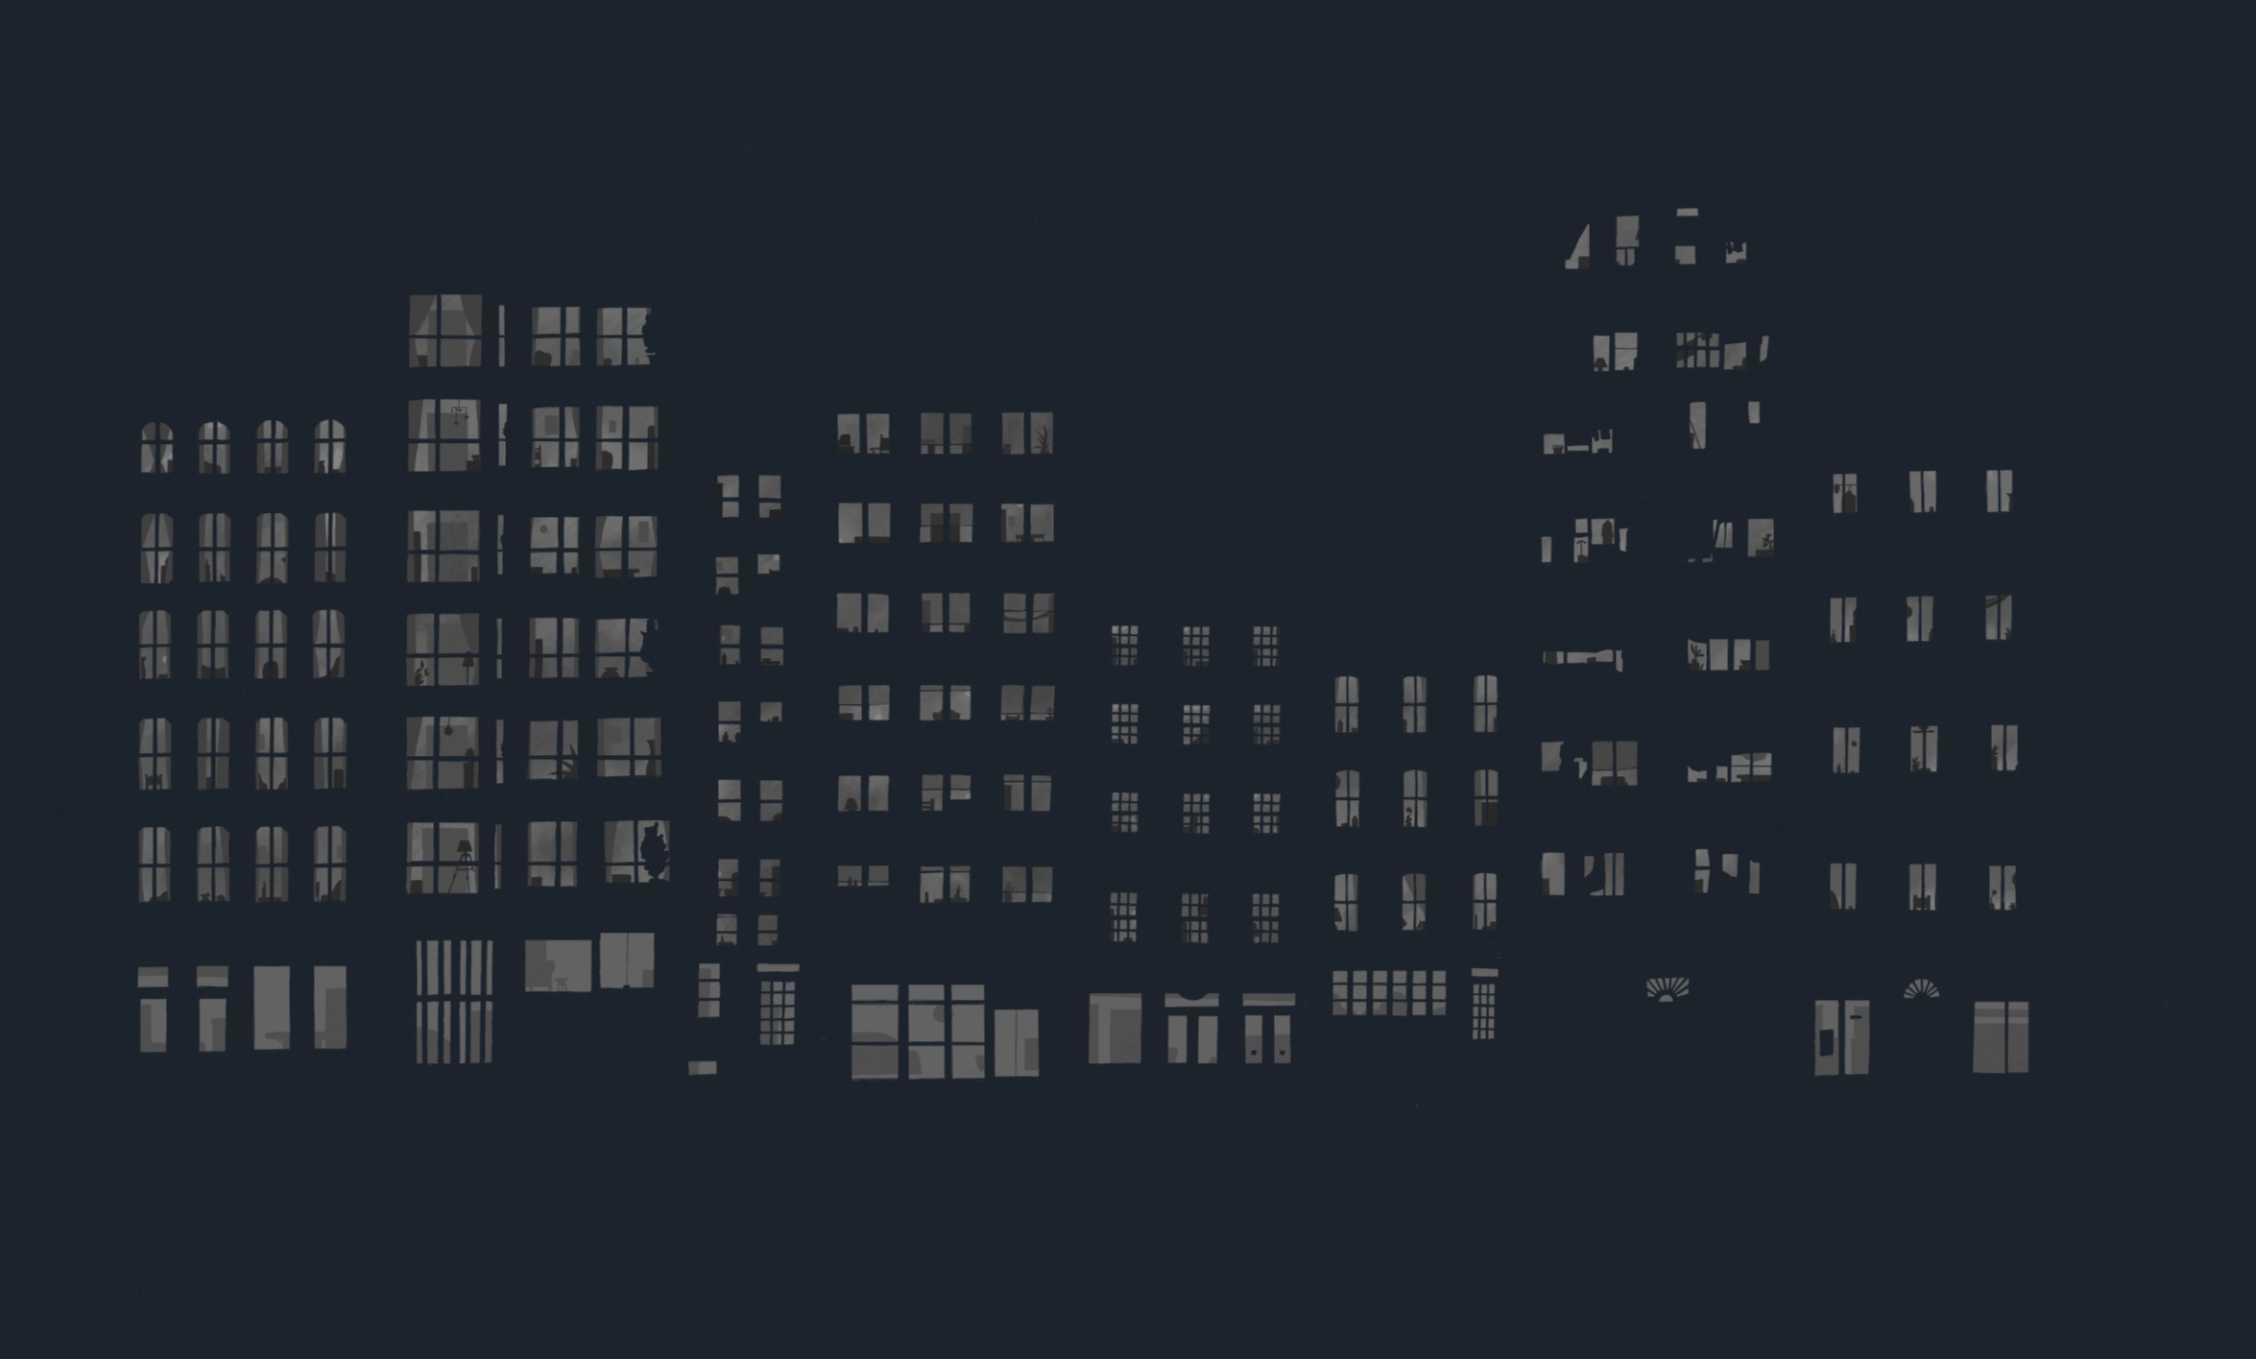 Building windows lit.